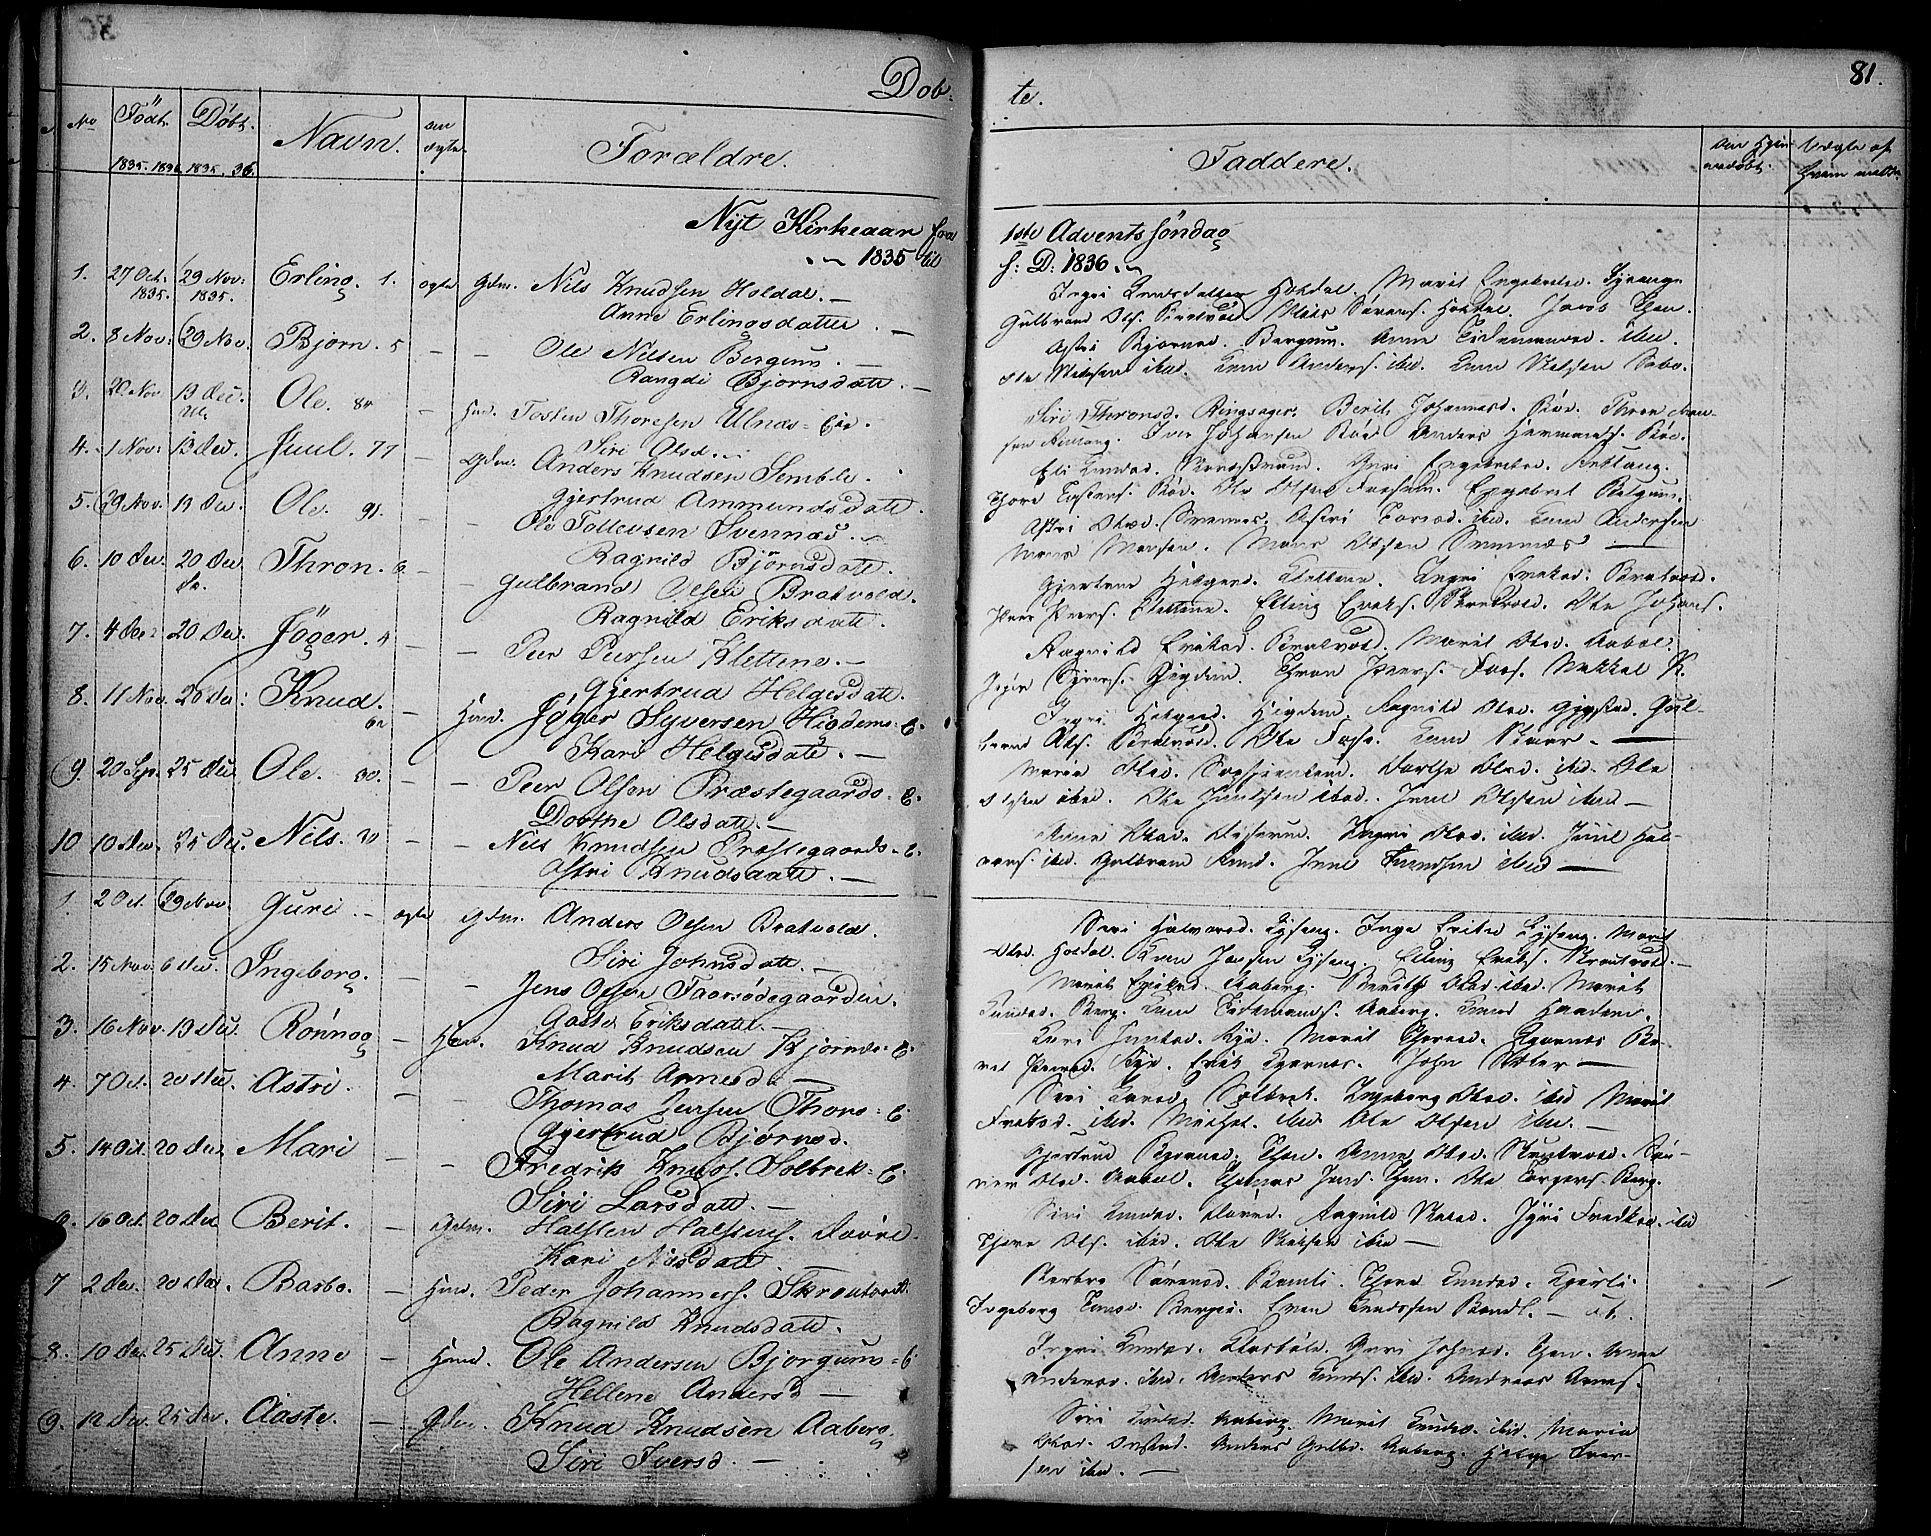 SAH, Nord-Aurdal prestekontor, Ministerialbok nr. 3, 1828-1841, s. 81